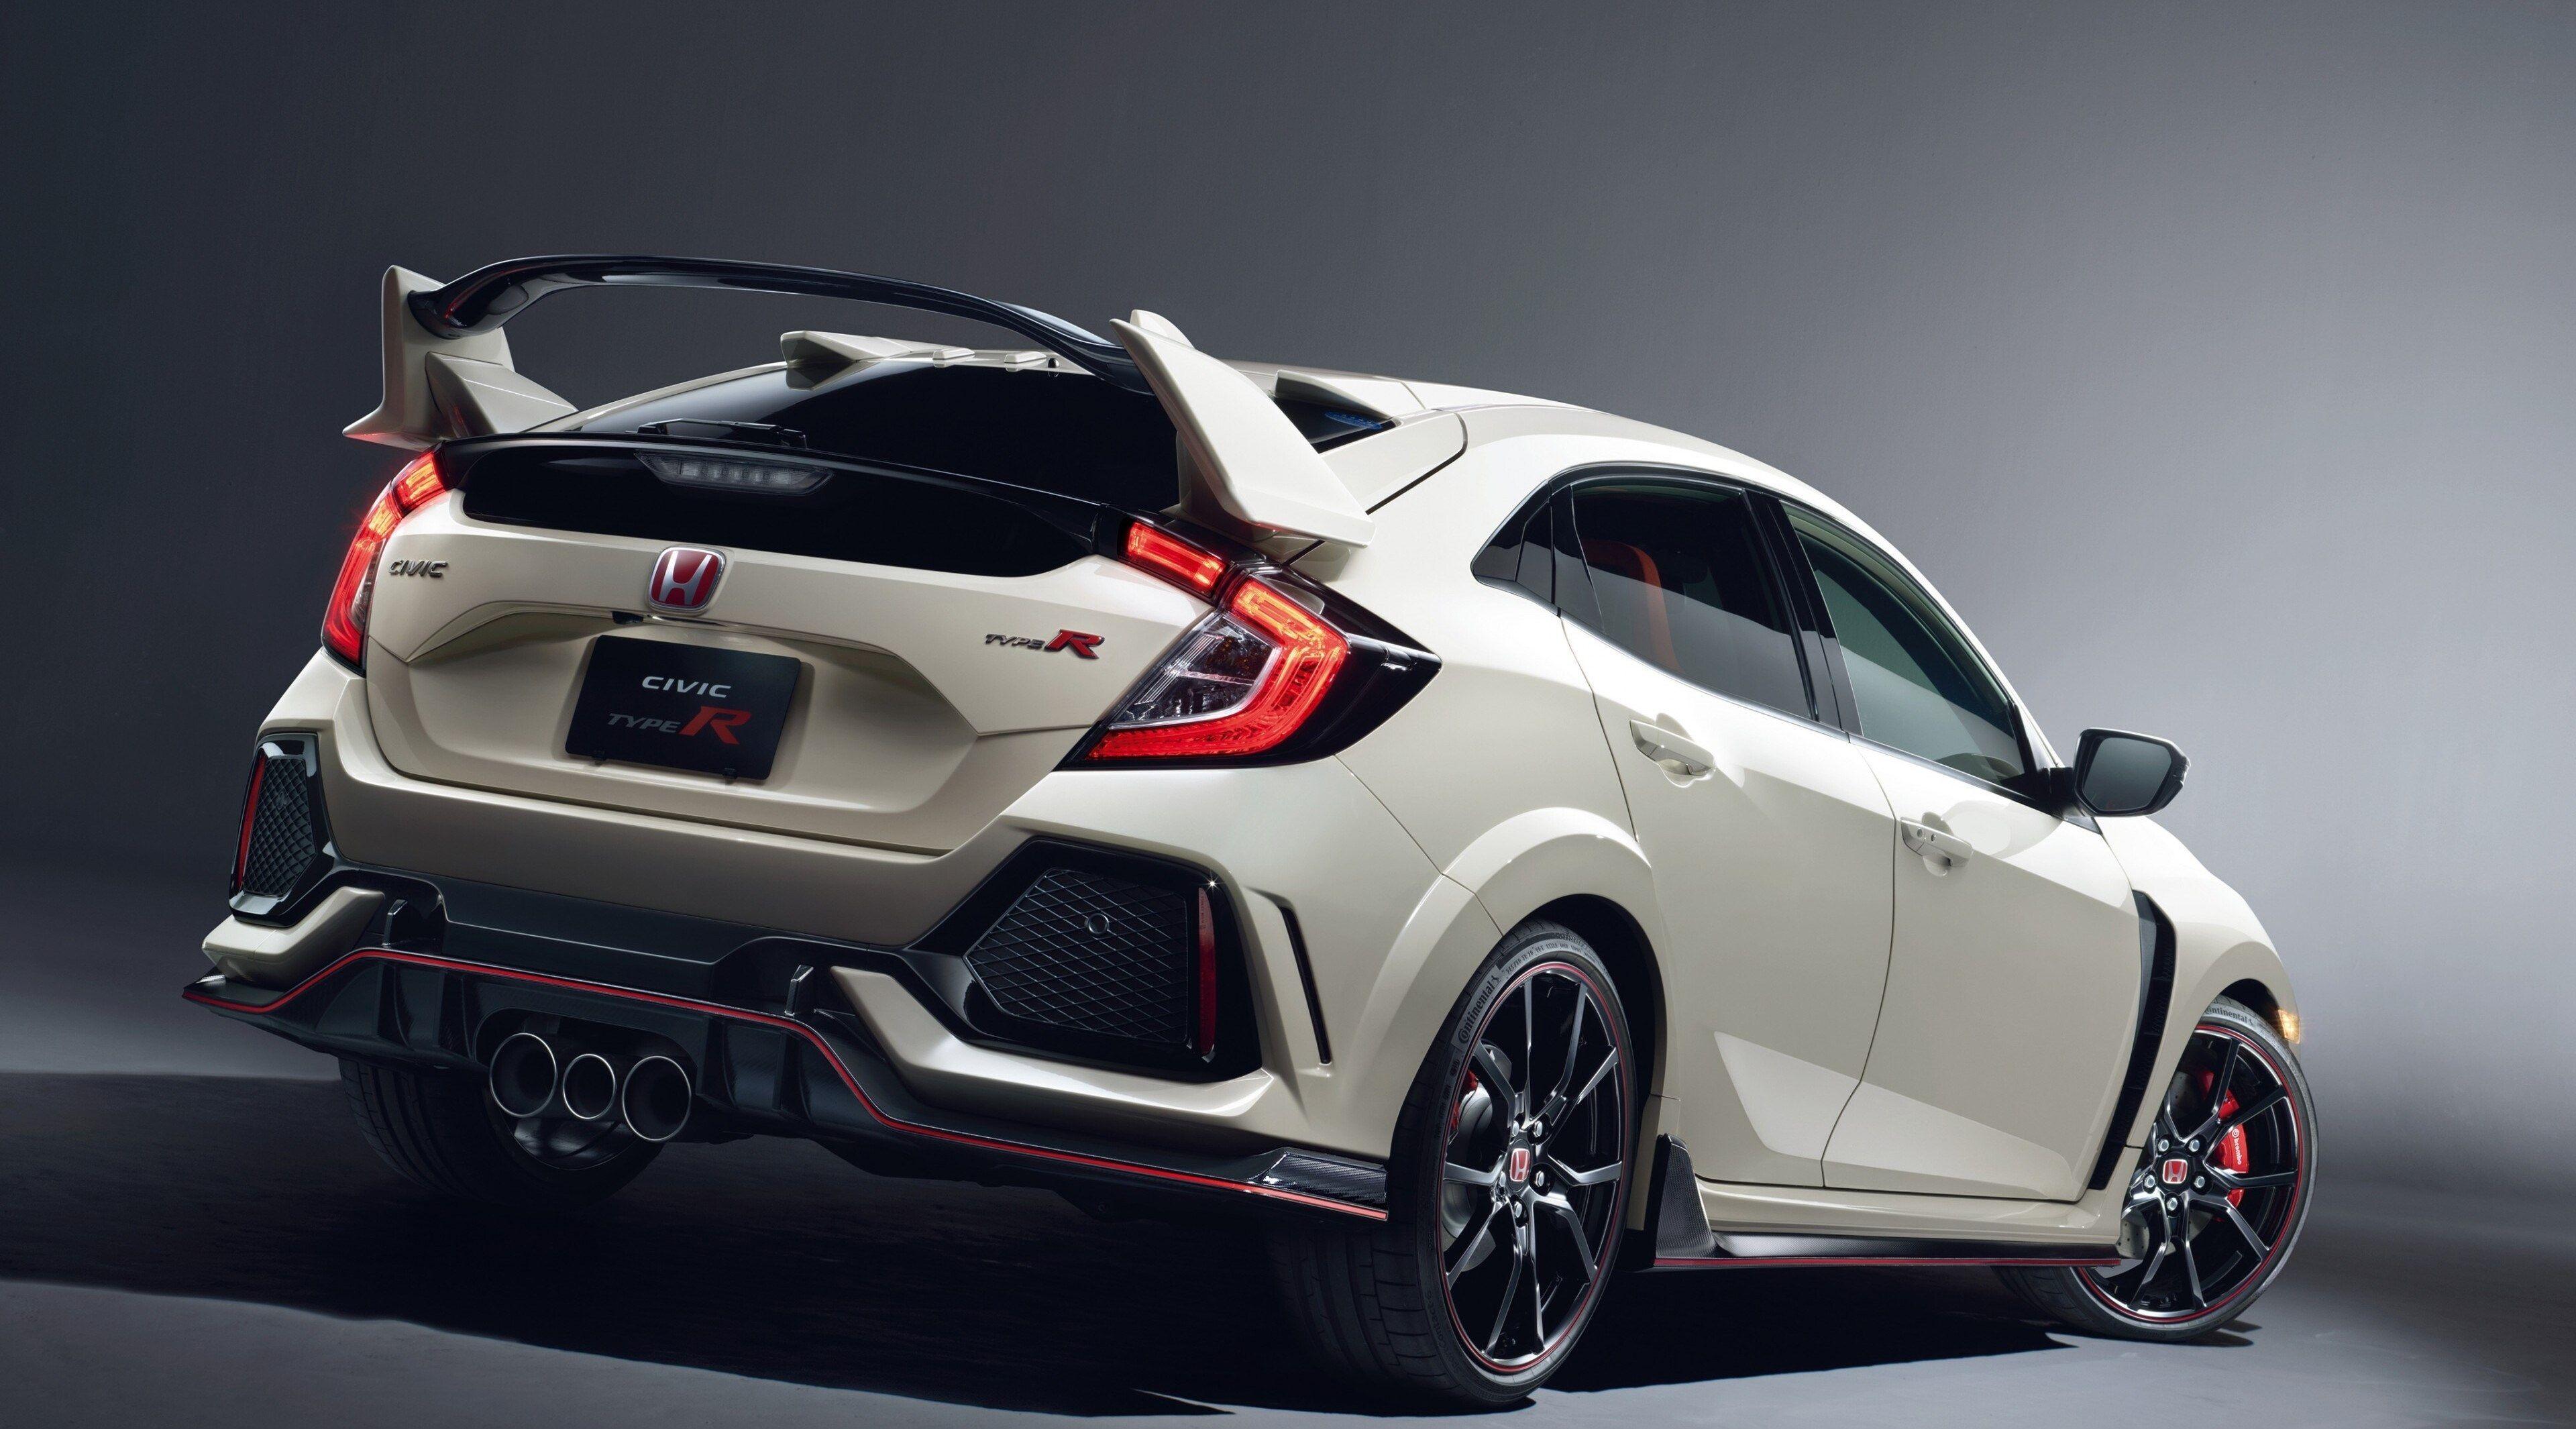 3840x2130 Honda Civic Type R 4k Hd Wallpapers With High Resolution Honda Civic Type R Honda Civic Hatchback Honda Civic